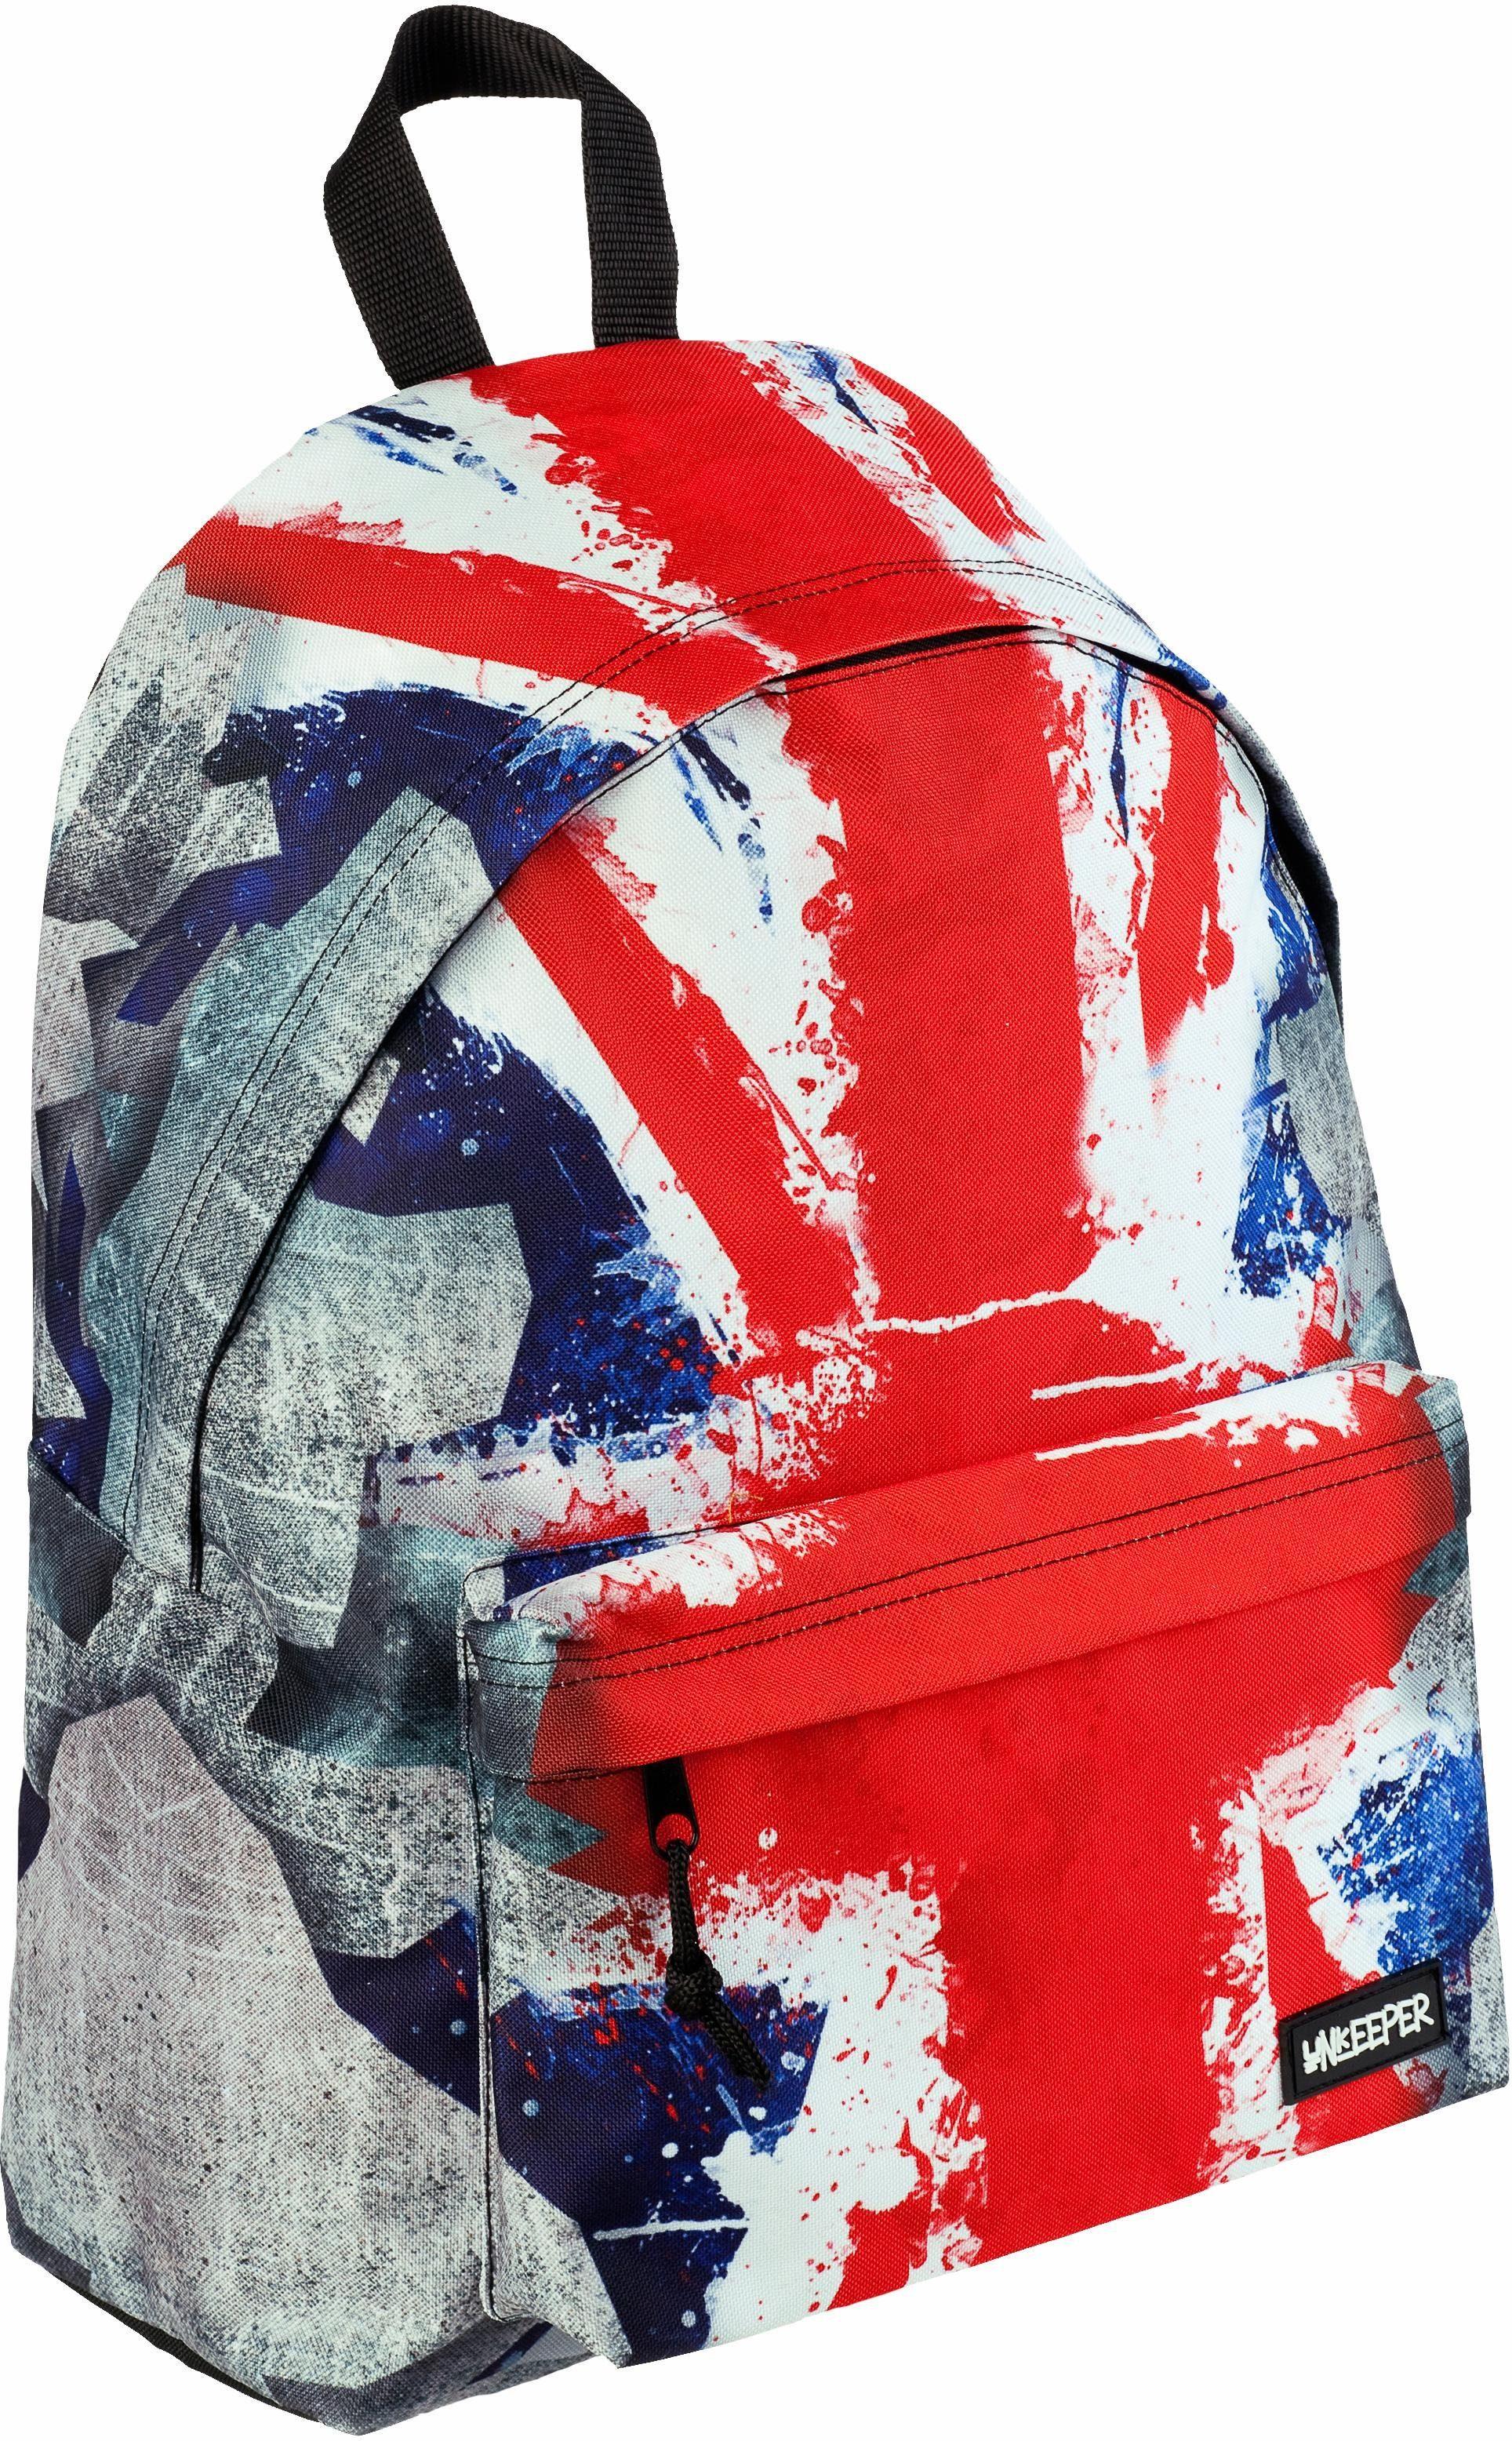 Unkeeper Rucksack, »Union Jack, Adventure Daypack«